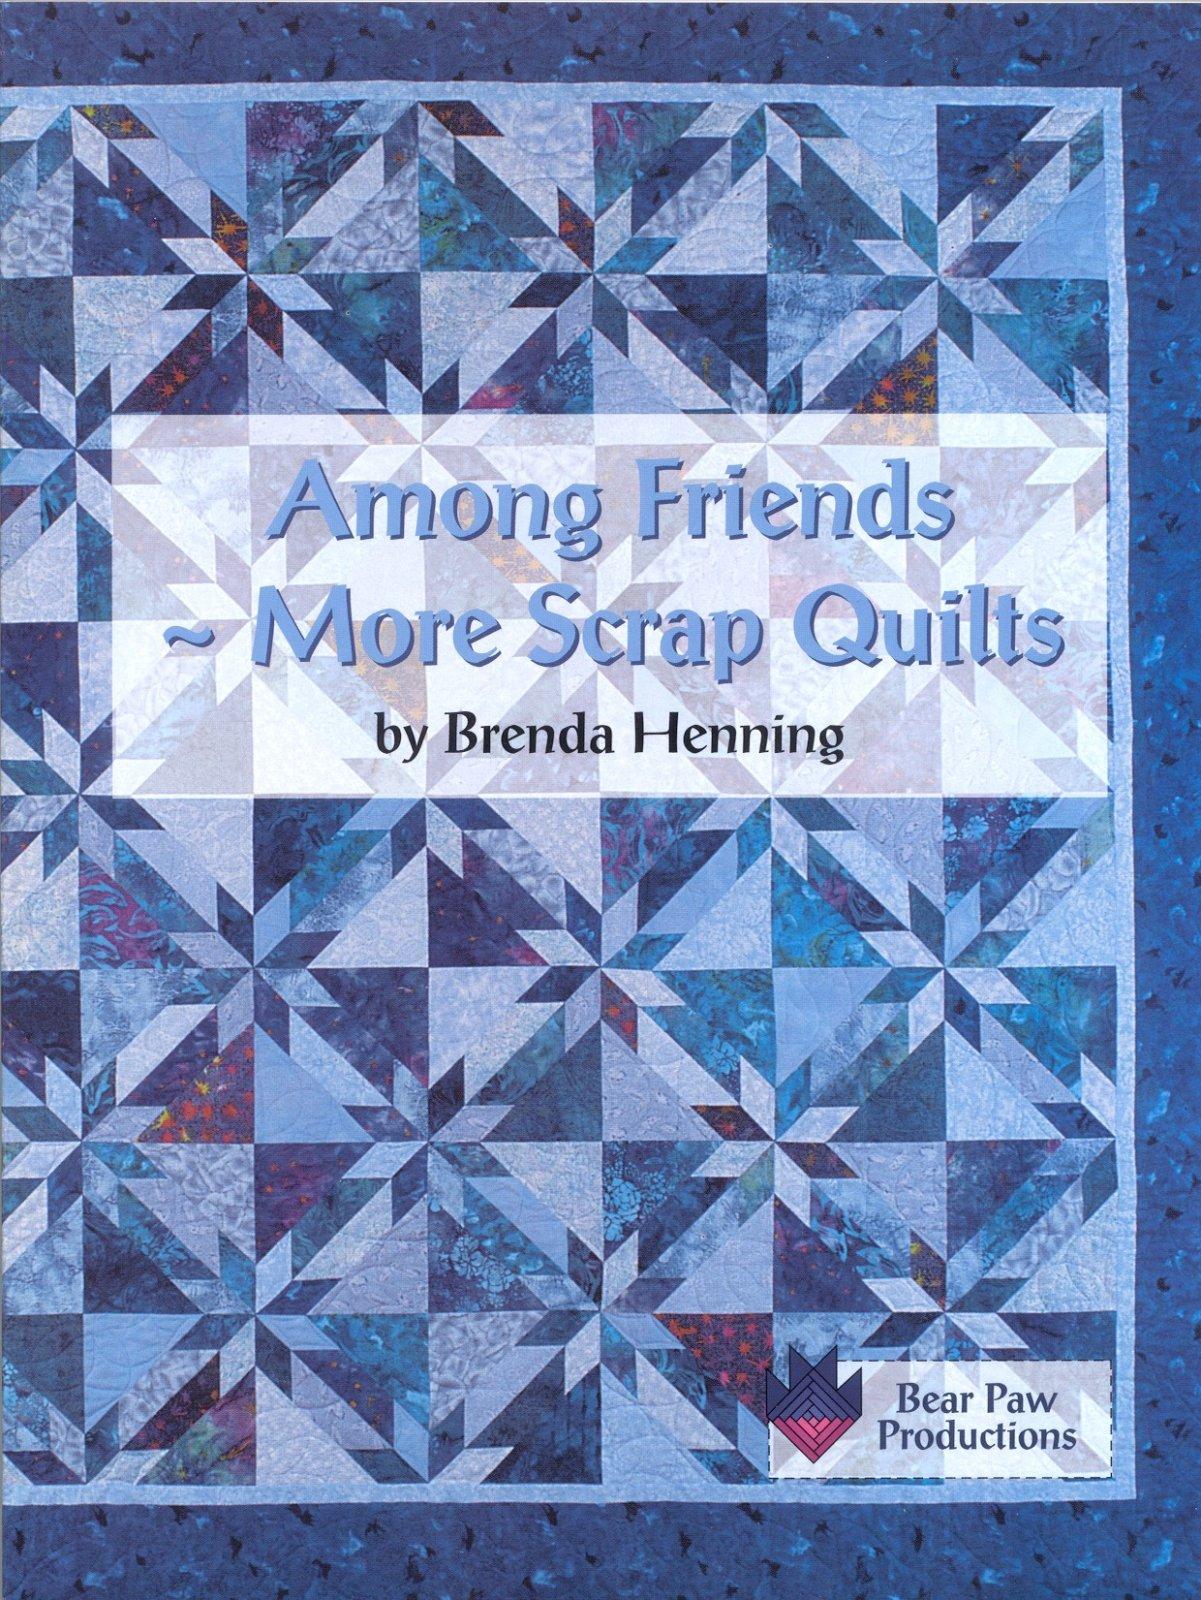 Among Friends ~ More Scrap Quilts